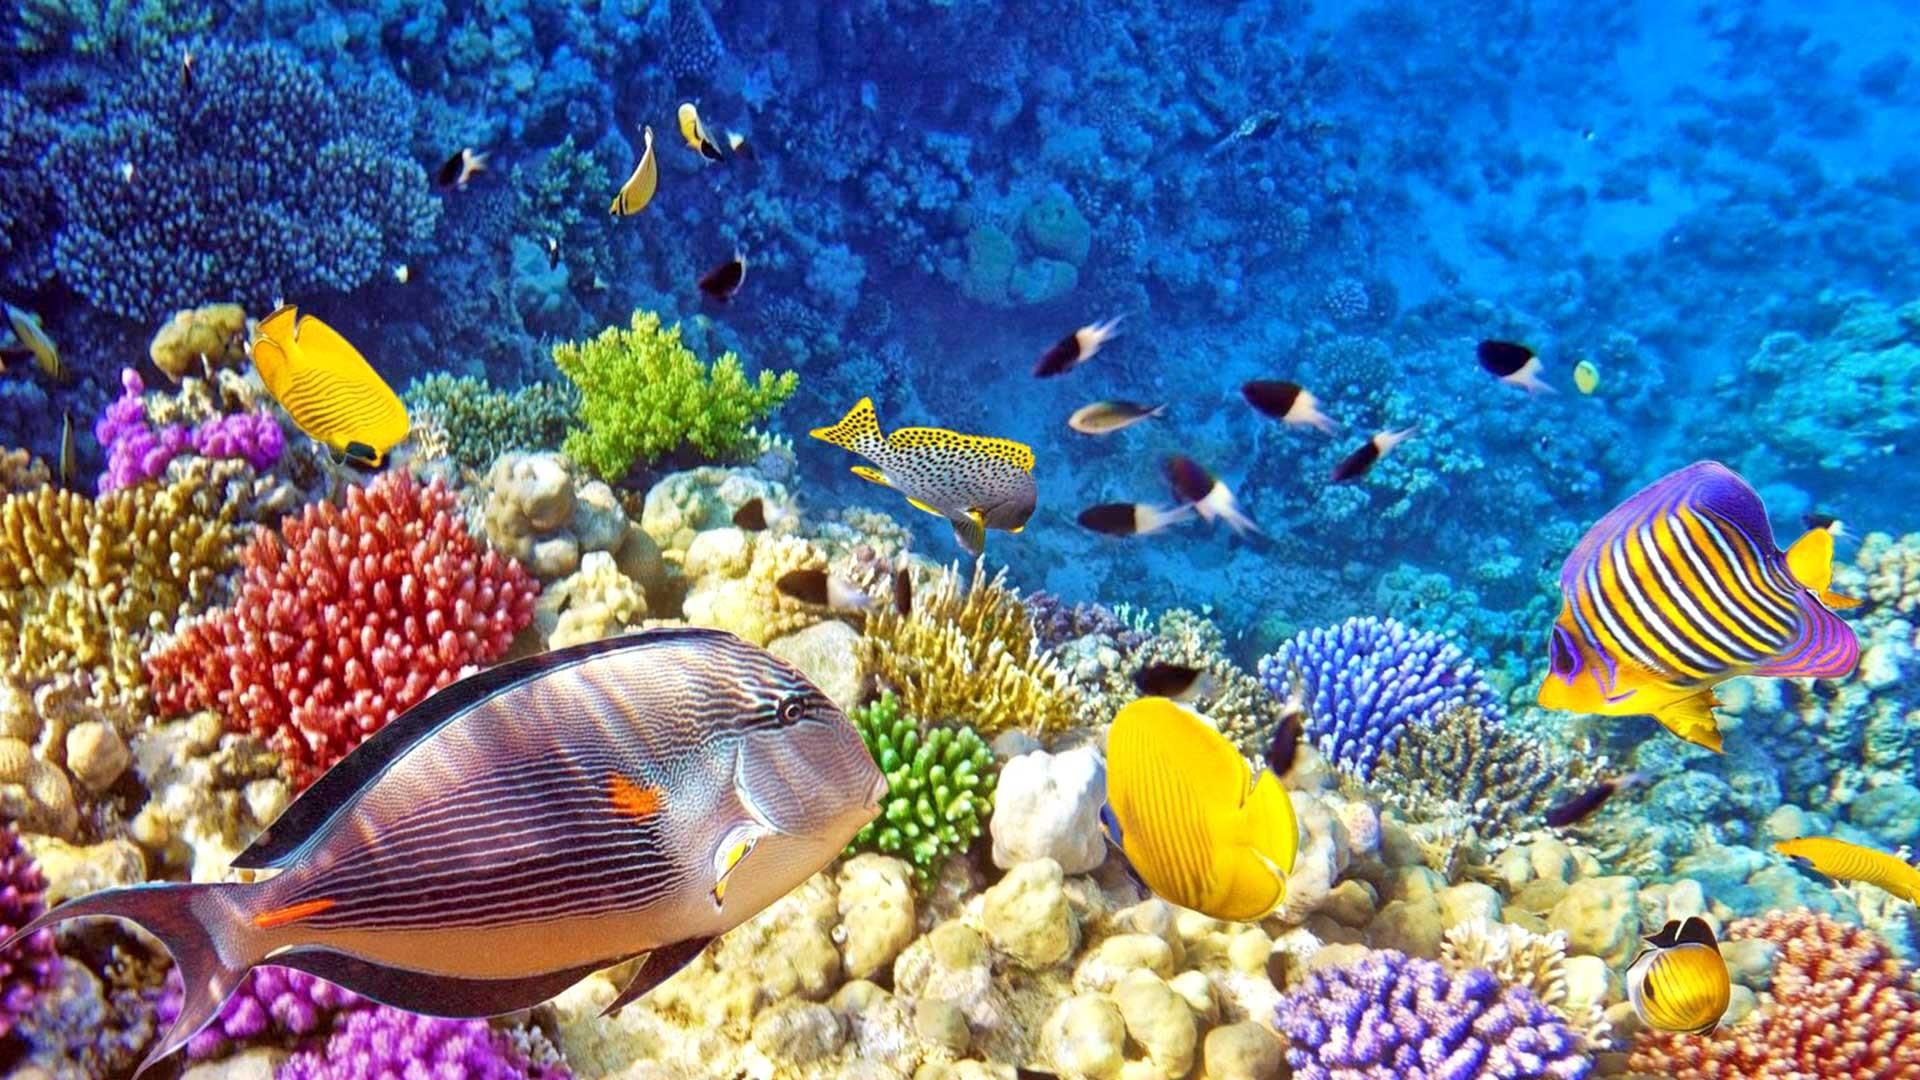 Iphone X Wallpaper 4k Live Raja Ampat Underwater Photo Tropical Colorful Fish Coral